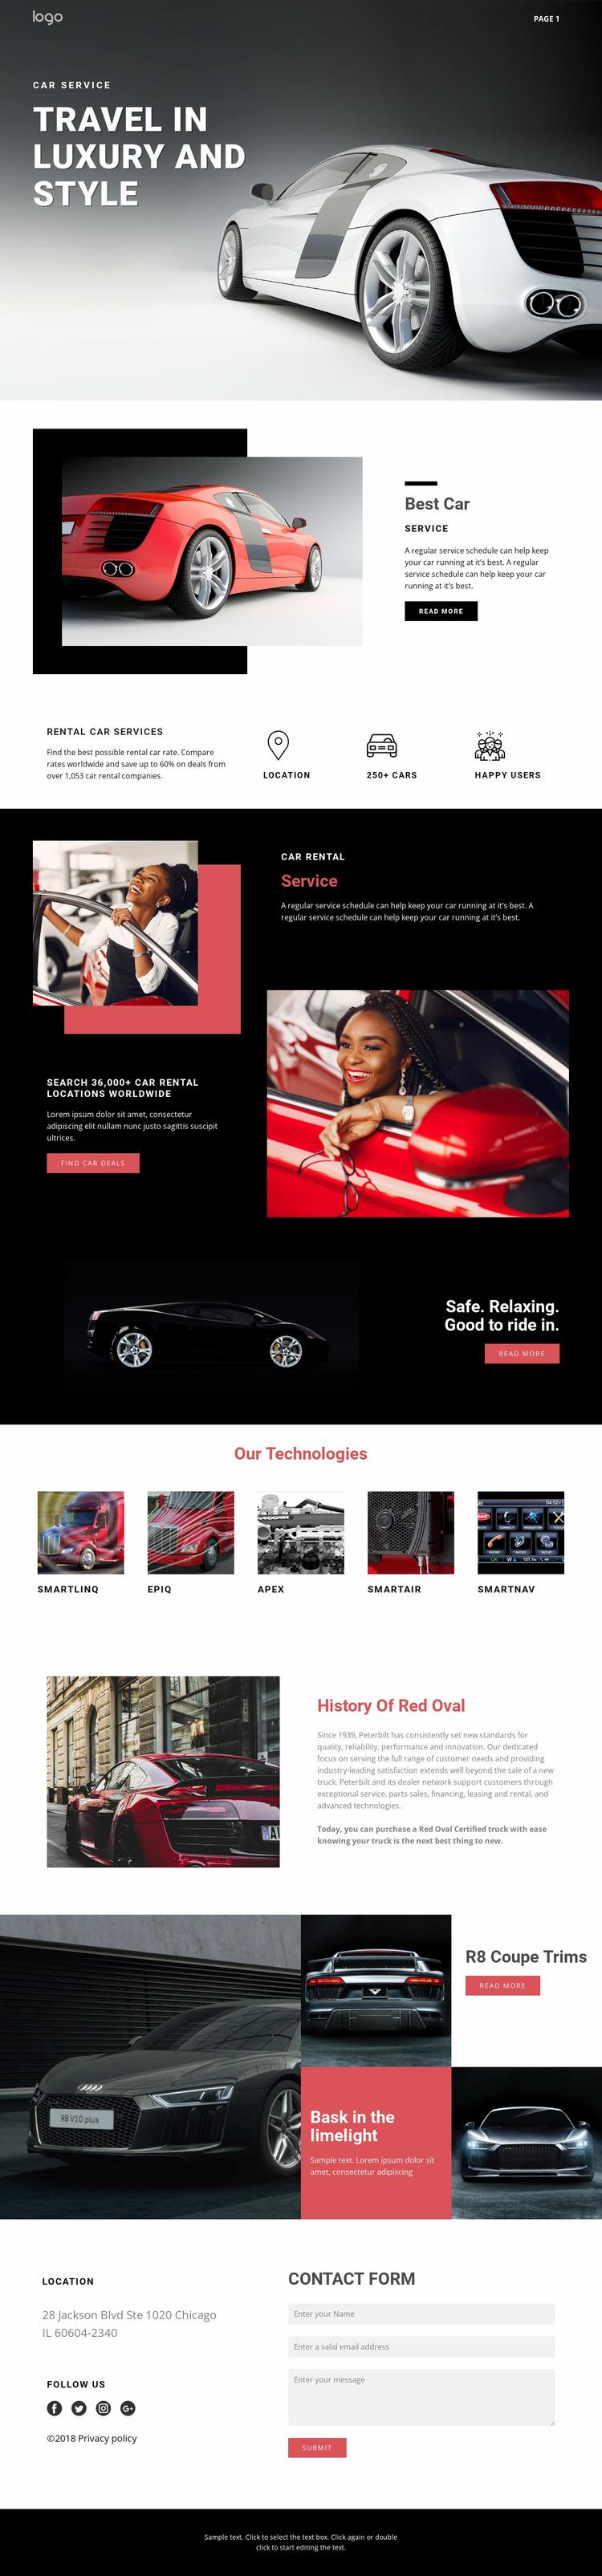 Traveling in luxury cars Website Mockup